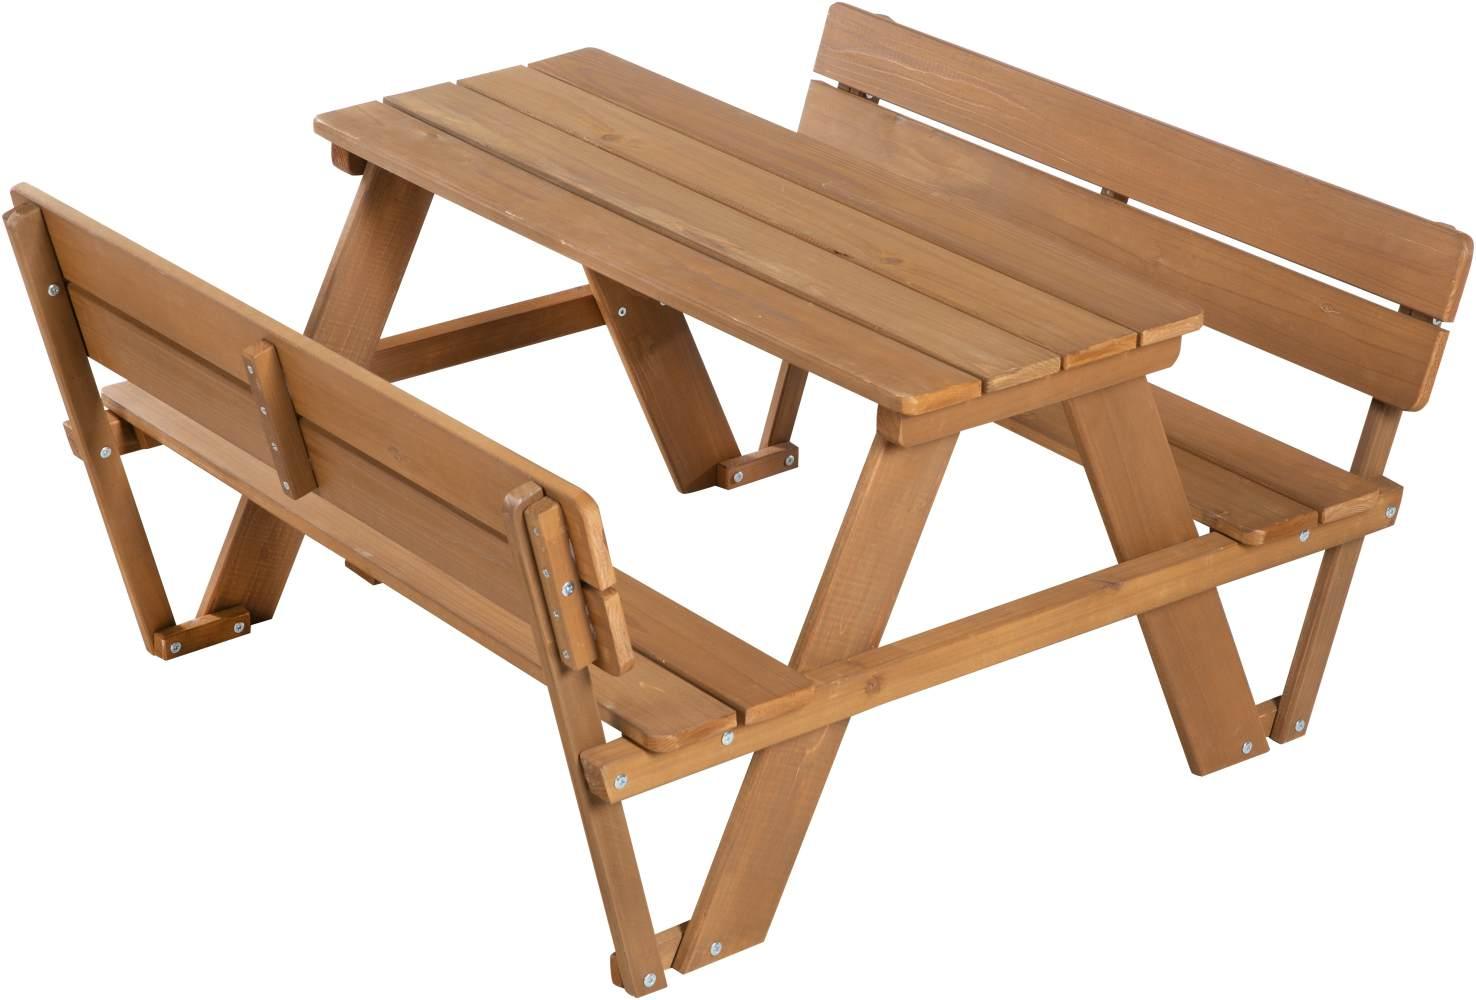 Roba 'PICKNICK for 4' Kindersitzgruppe Deluxe, mit Lehne braun Bild 1